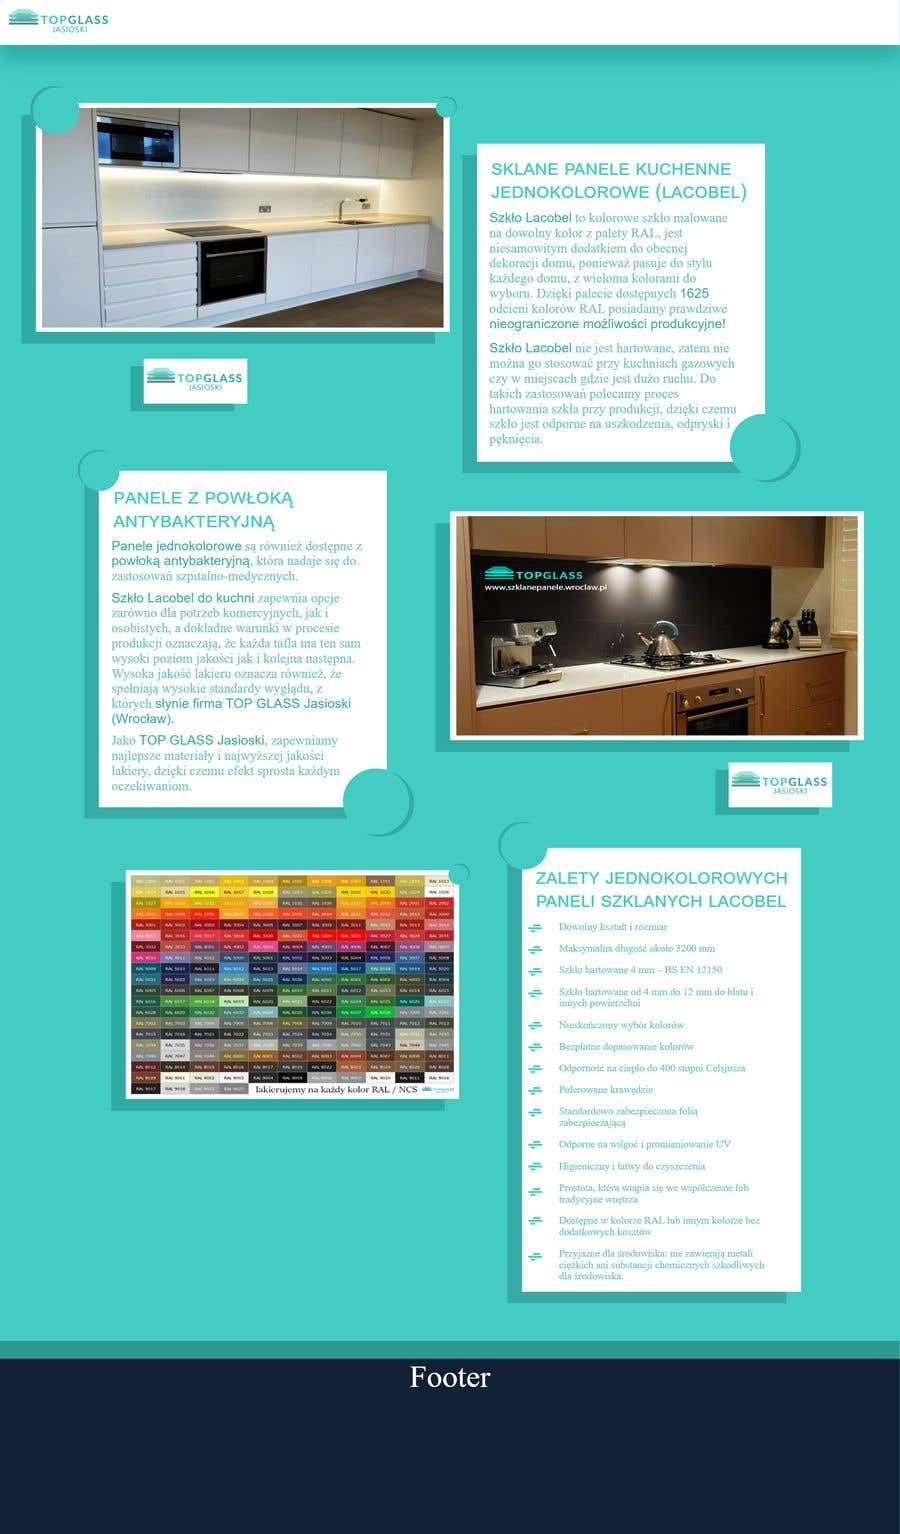 Proposition n°                                        4                                      du concours                                         Re-design website for easier UX and UI